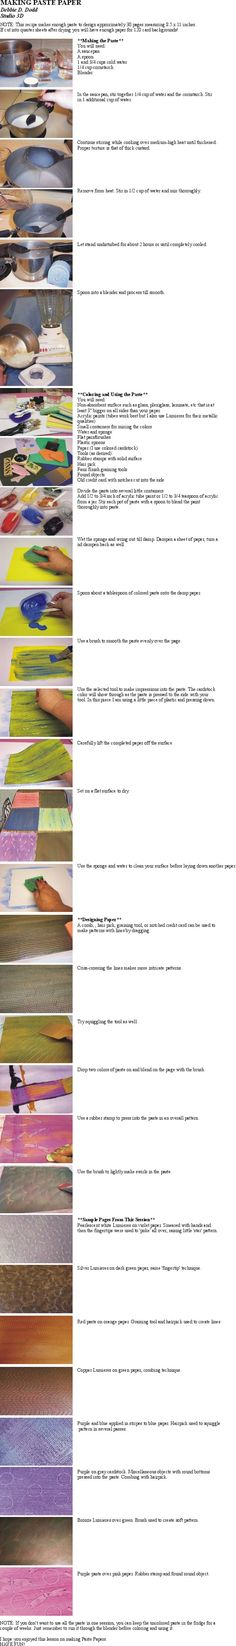 STUDIO 3D - PASTE PAPER